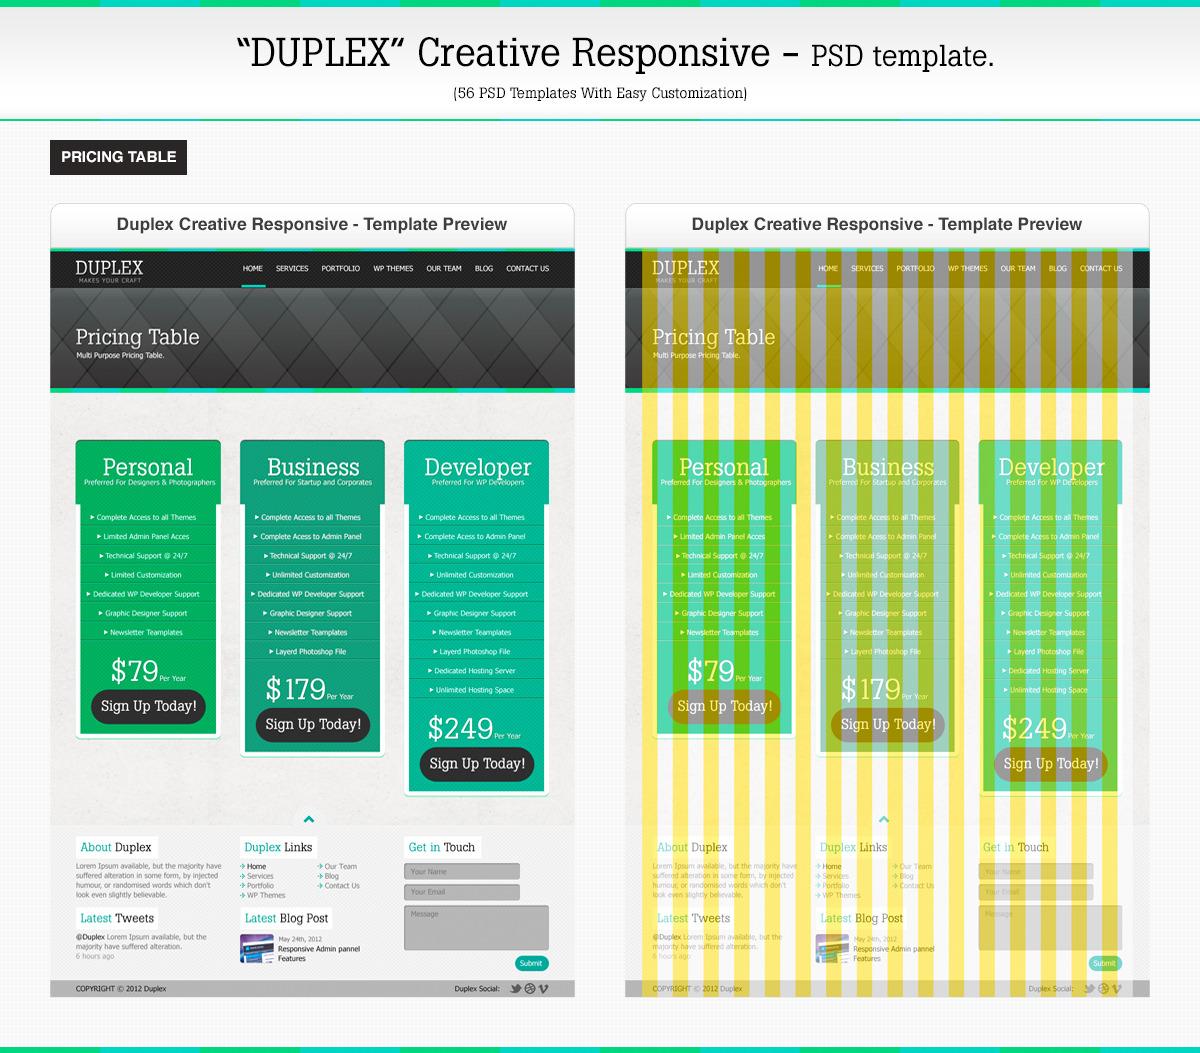 Duplex Creative Responsive PSD Template